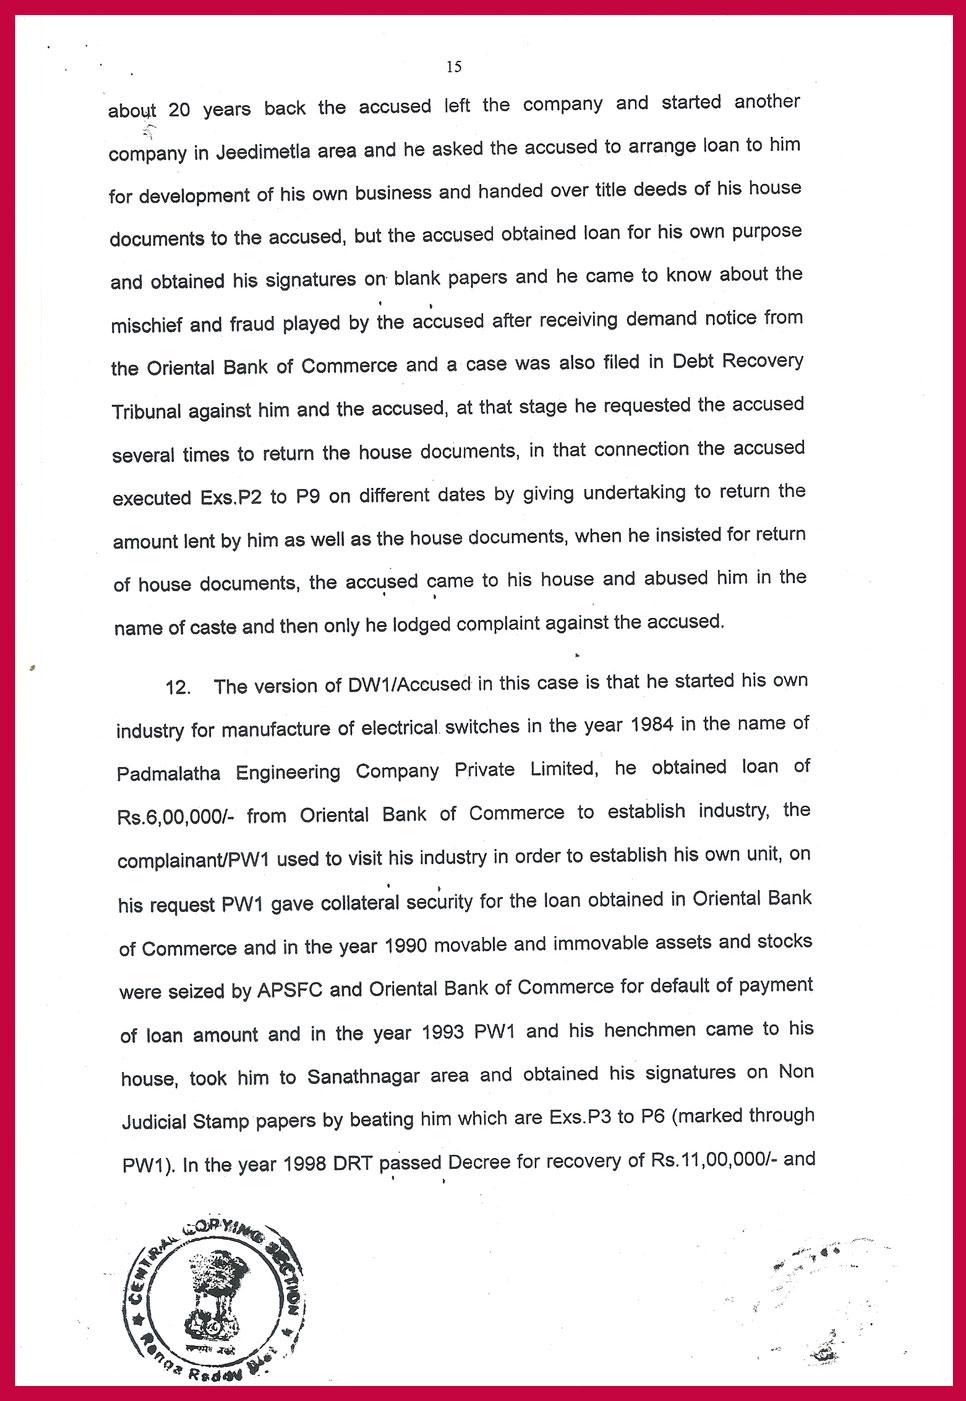 Ranga Reddy Court Judgment period 294 days-15